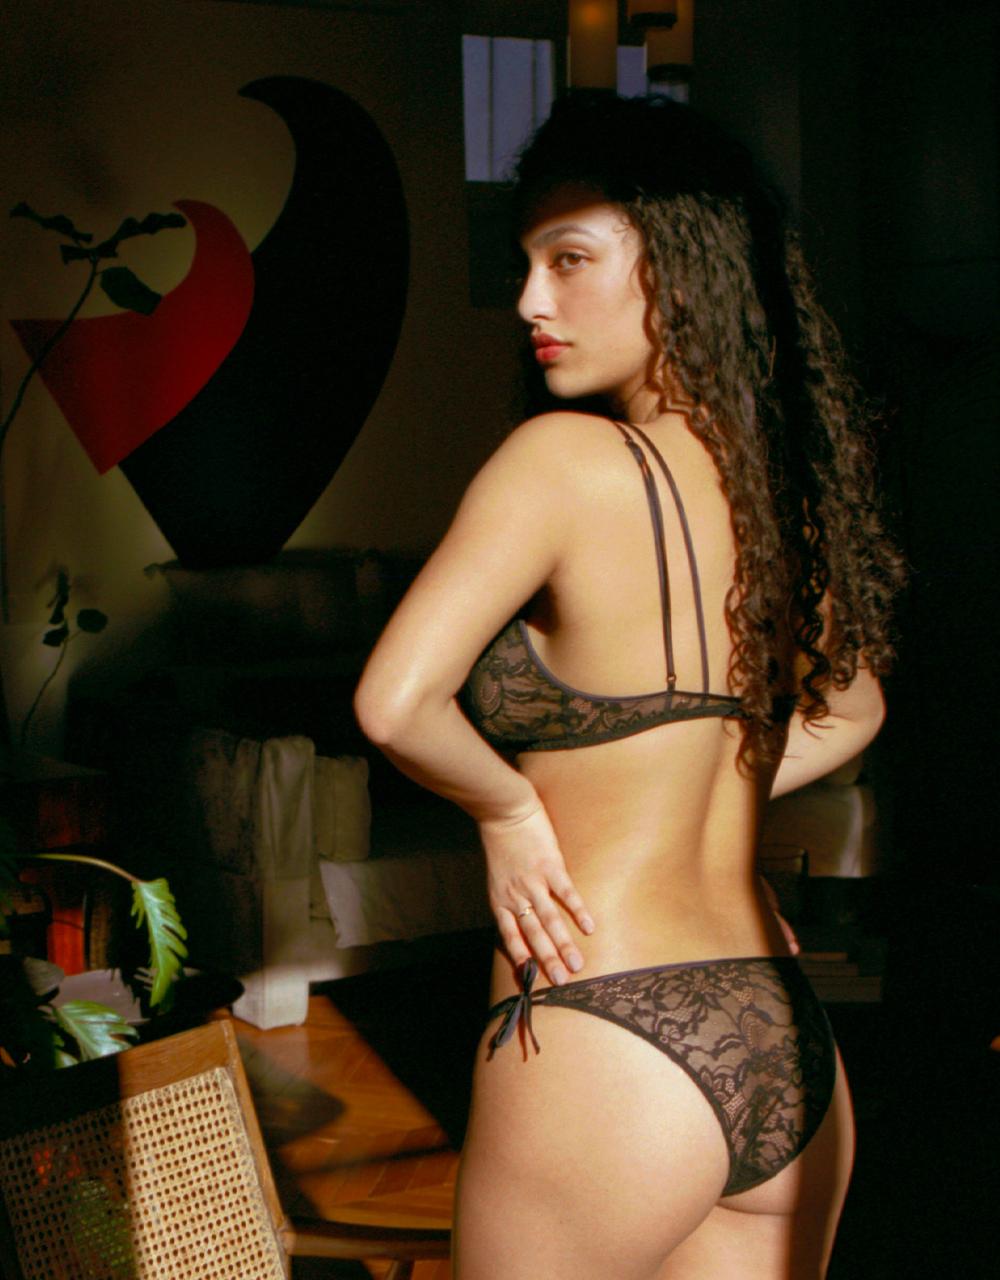 lingerie culotte Black Tie Noir Forever 19 € Girls In Paris photo 1